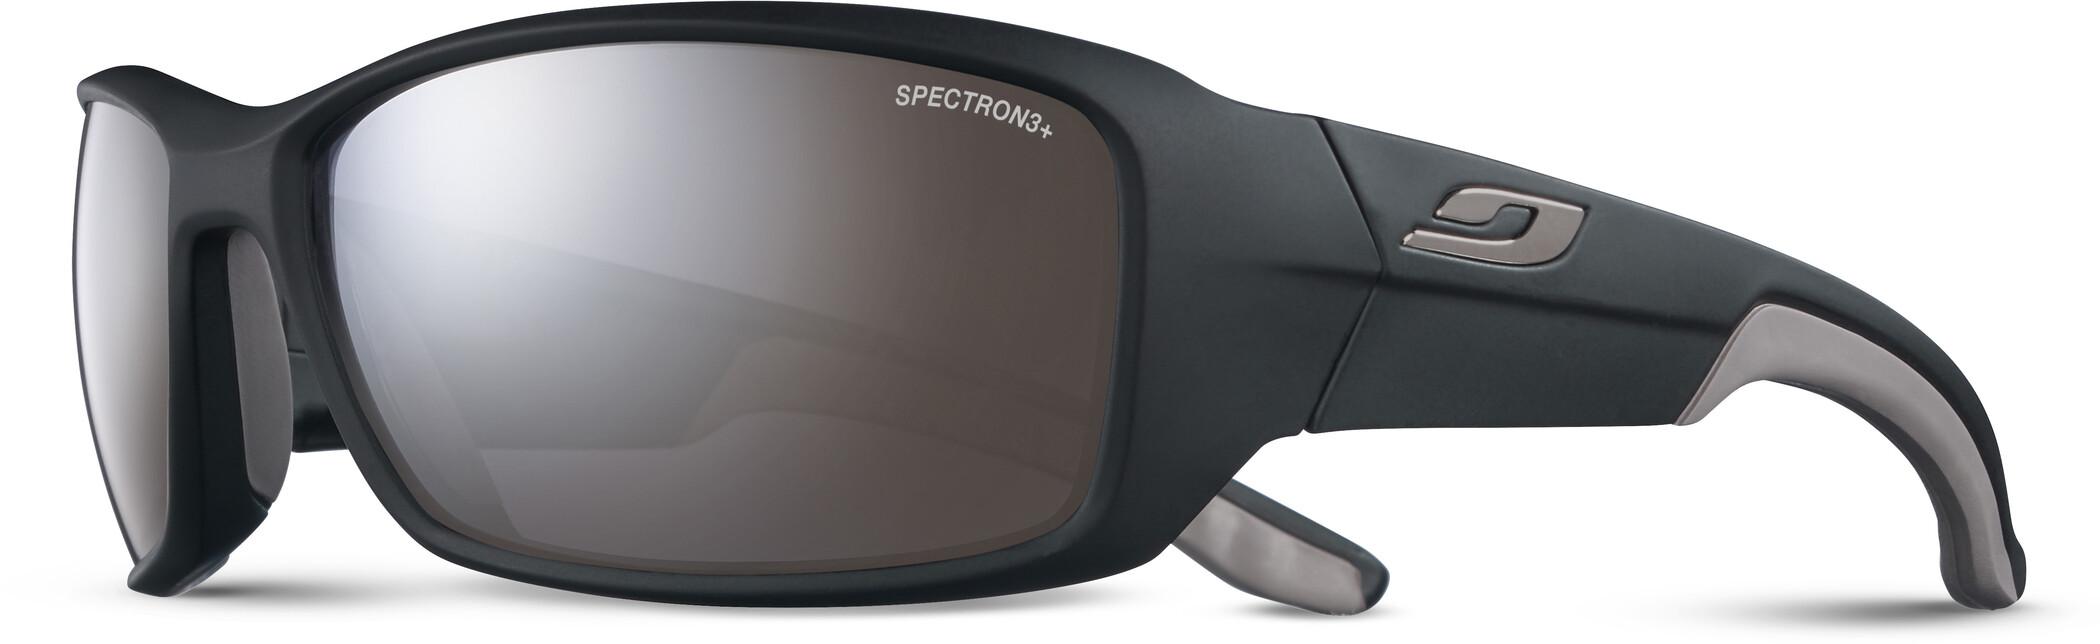 Julbo Run Spectron 3+ Solbriller Herrer, matt black/grey/grey flash silver (2020) | Glasses